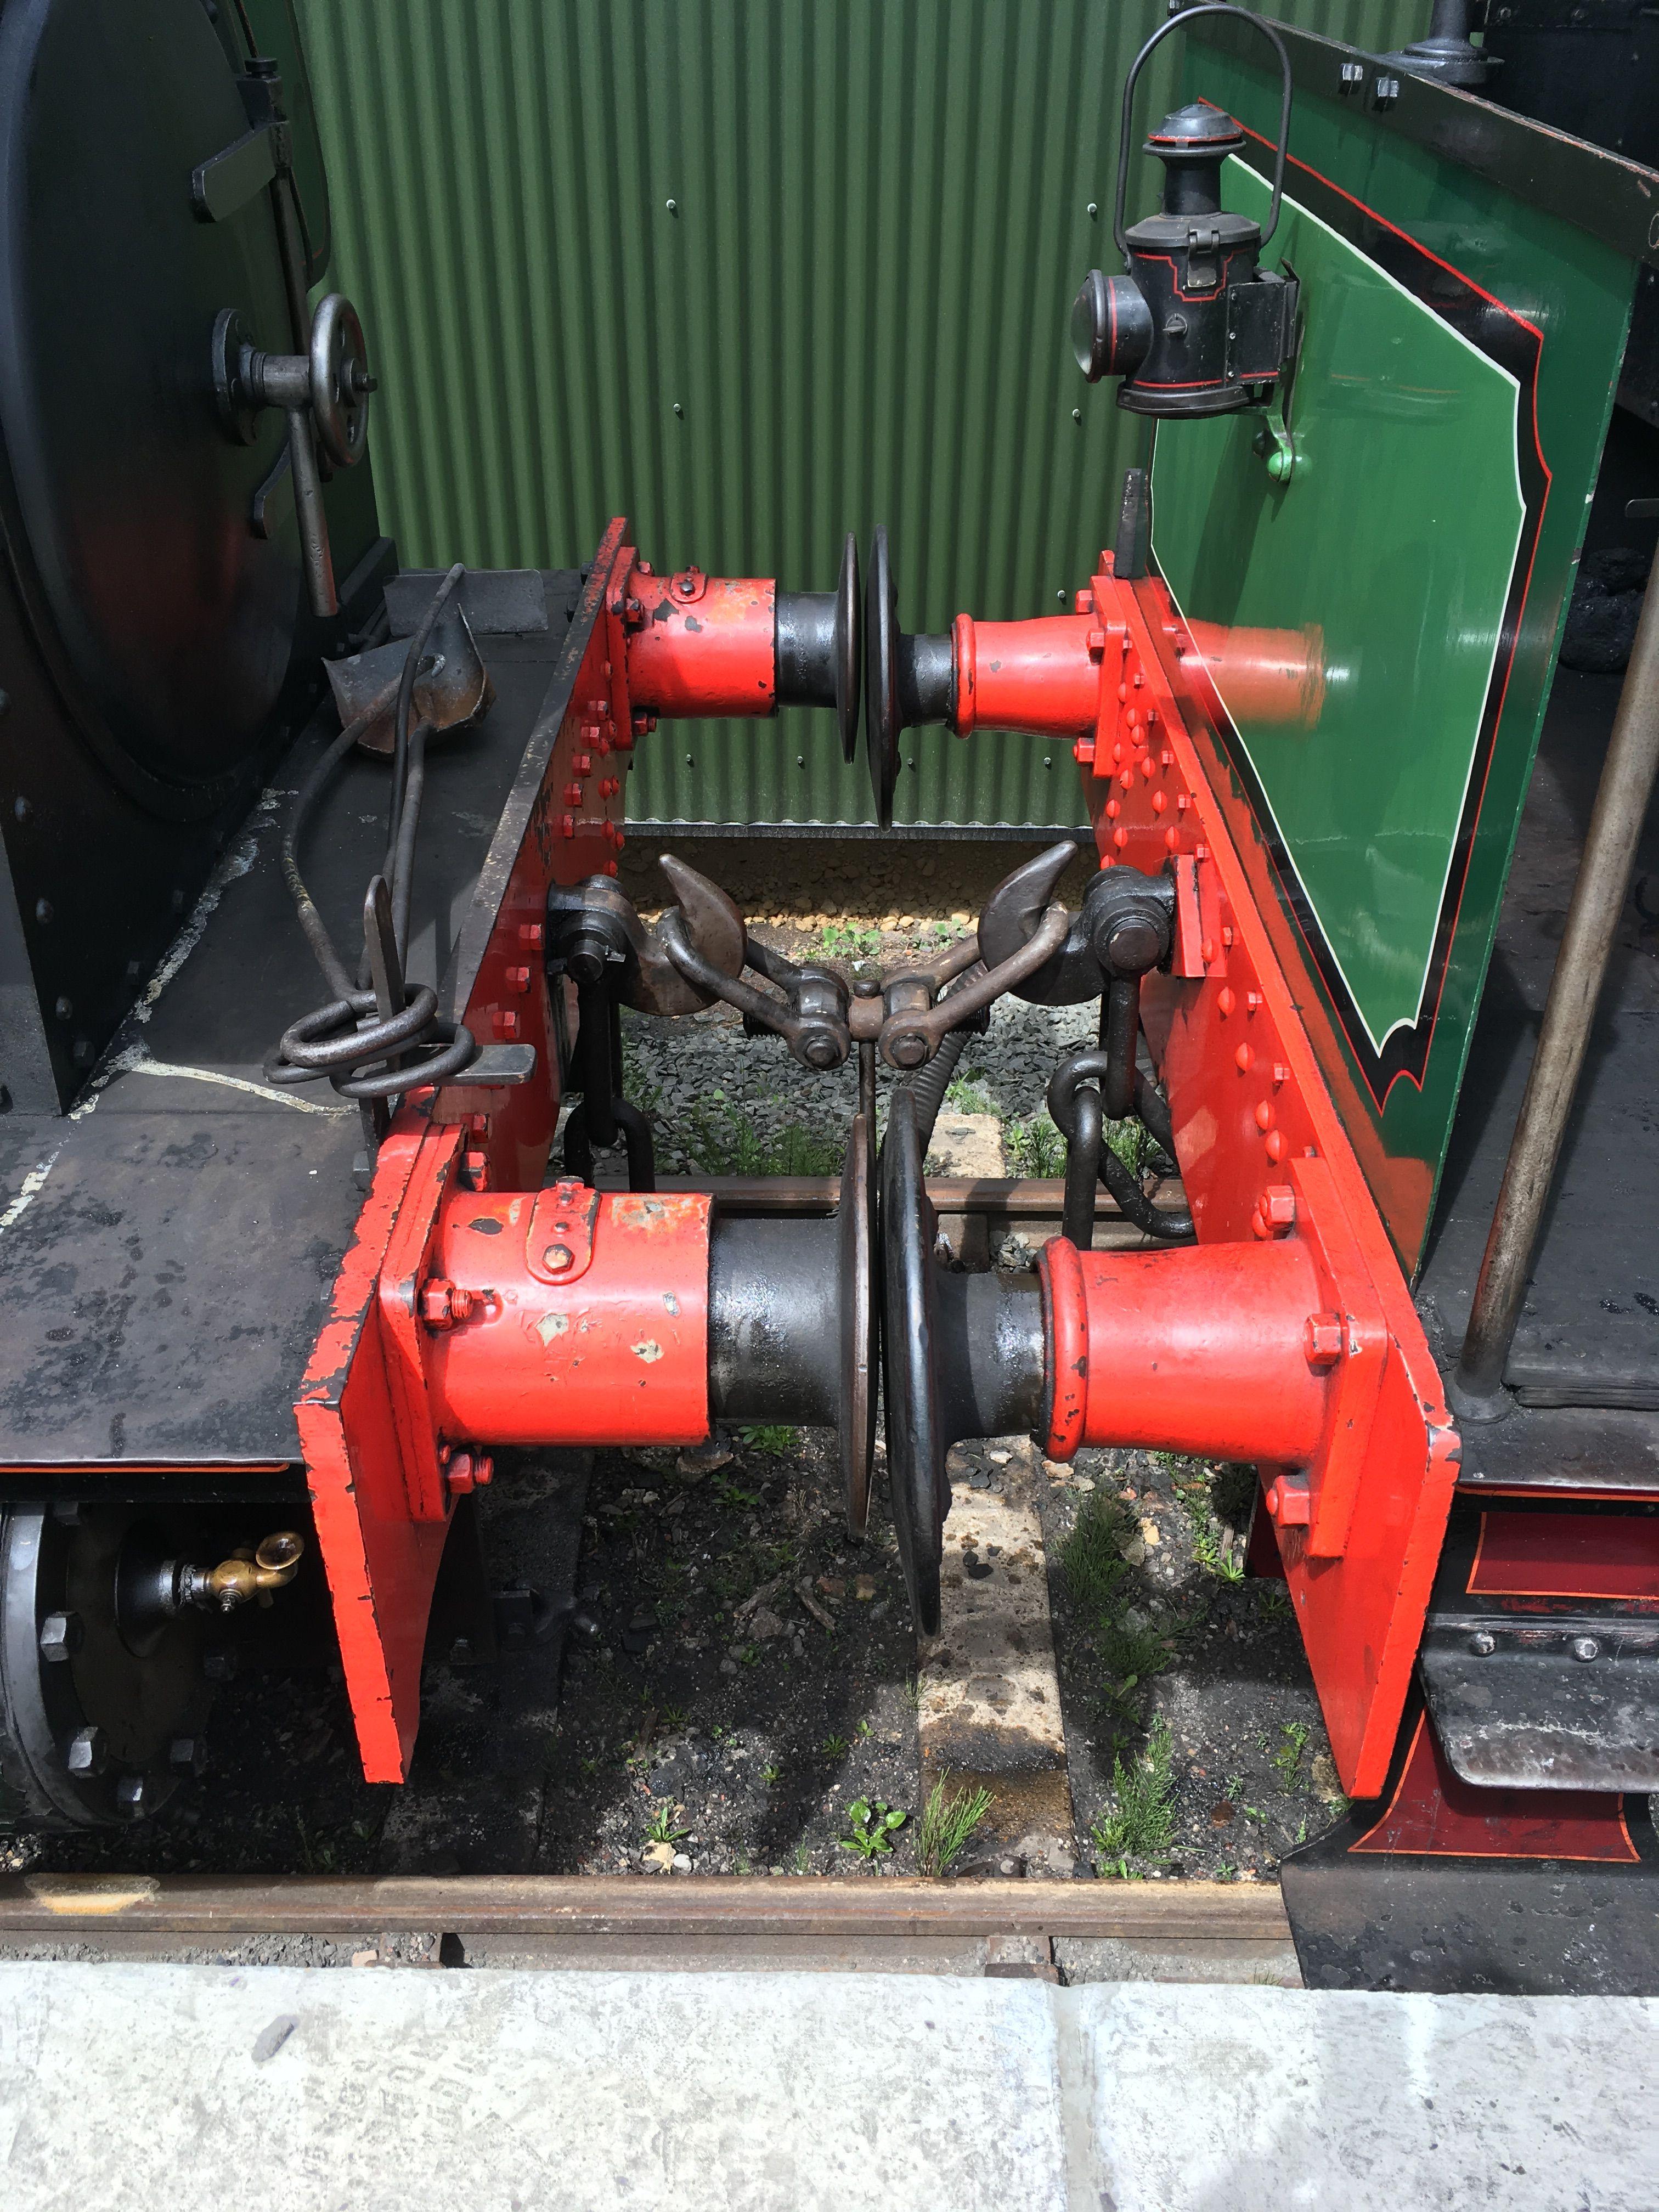 Pin on Railway Stuff.